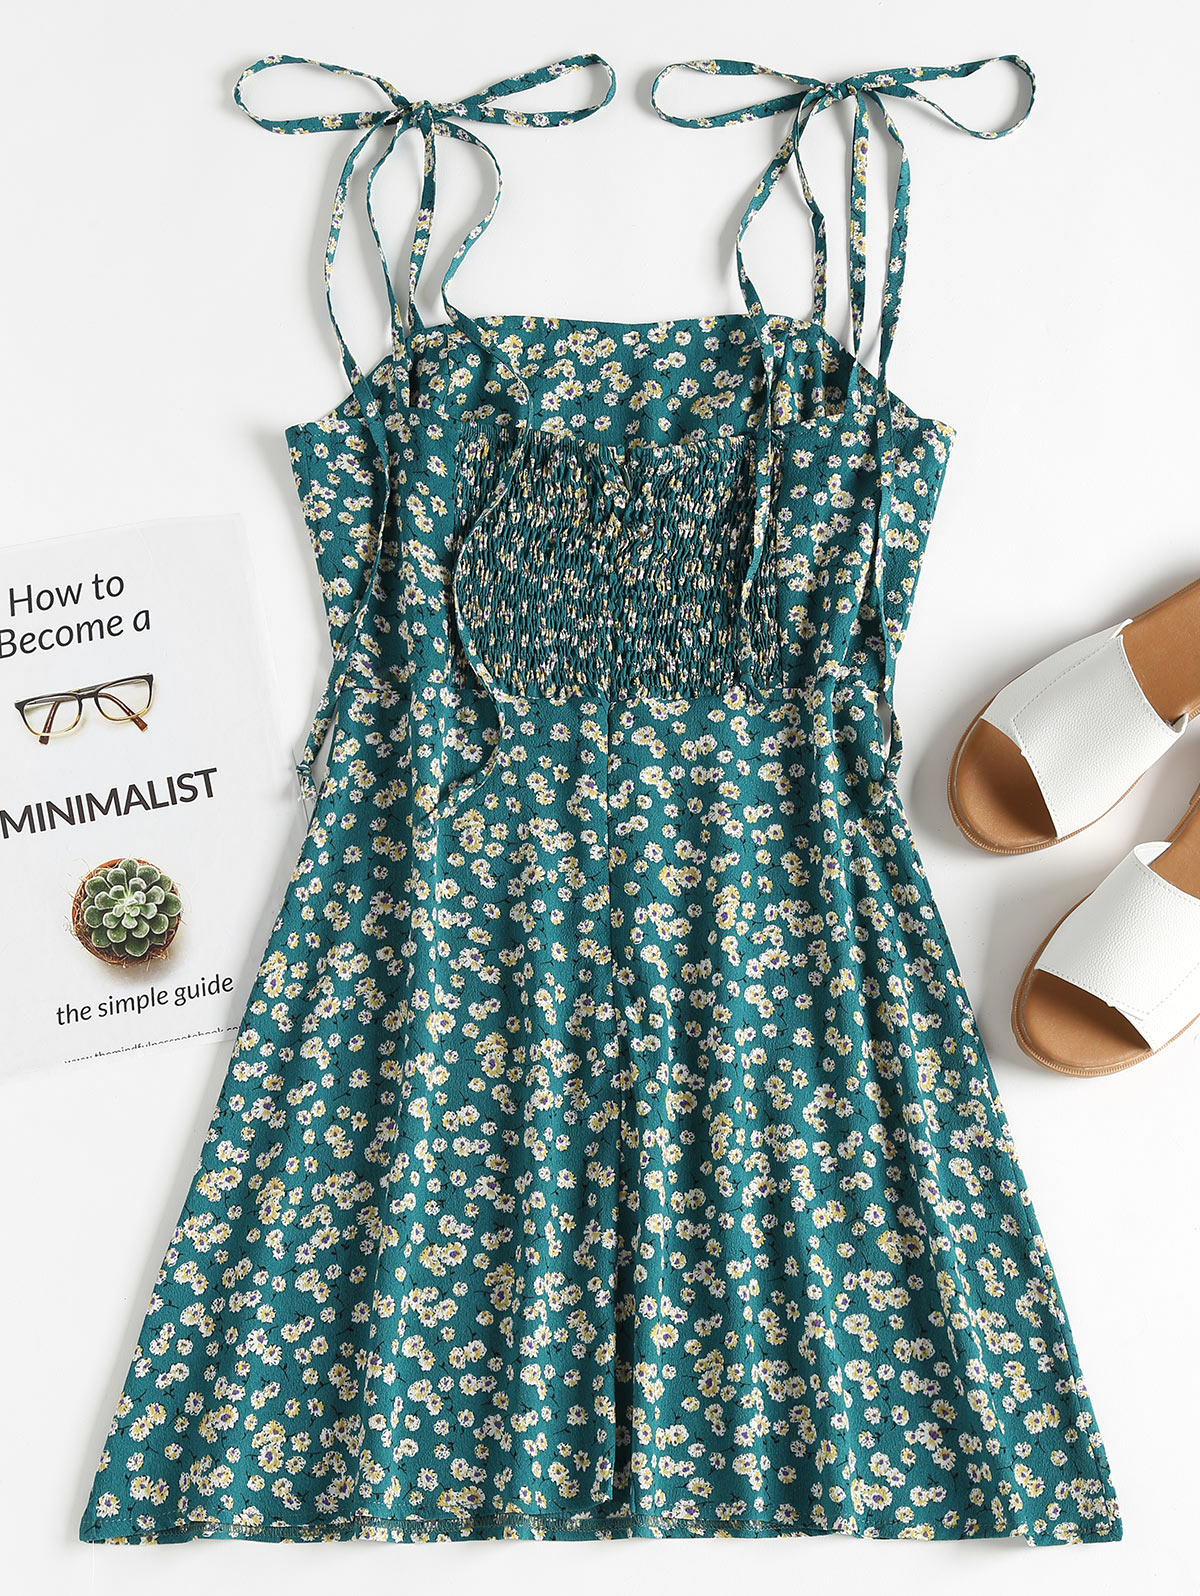 d03ebe889d5 Wipalo Boho Floral Tie Strap Apron Mini Sundress Green Prints Spaghetti  Strap Mini Dress Women Sundress Summer Dresses 2018 on Aliexpress.com